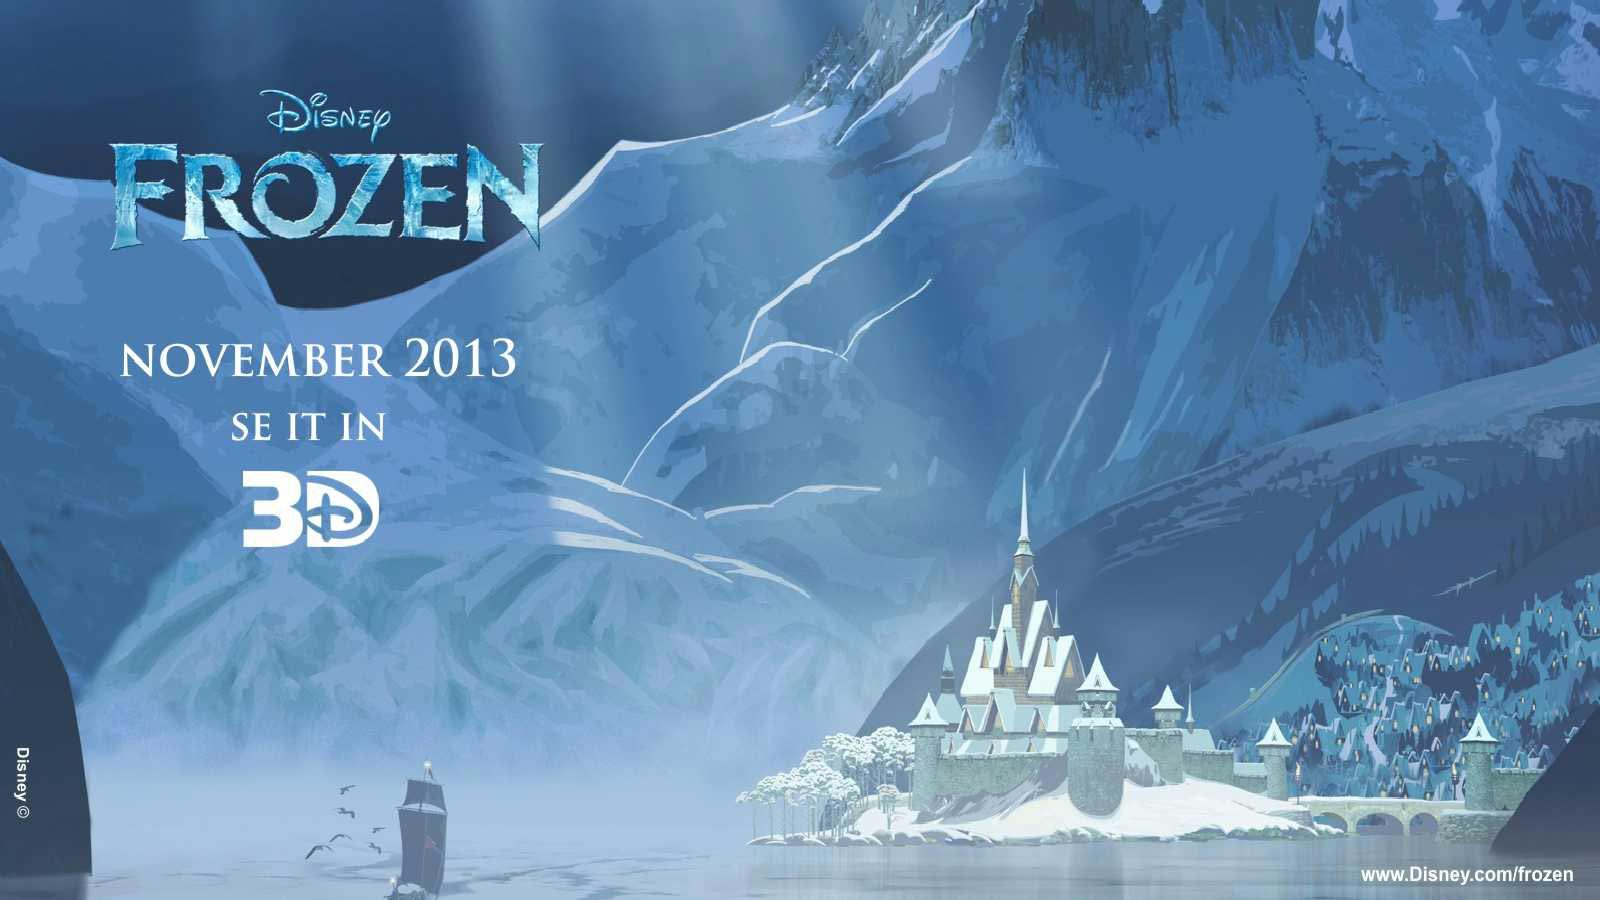 frozen 2013 desktop backgrounds frozen movie wallpapers free 1600x900